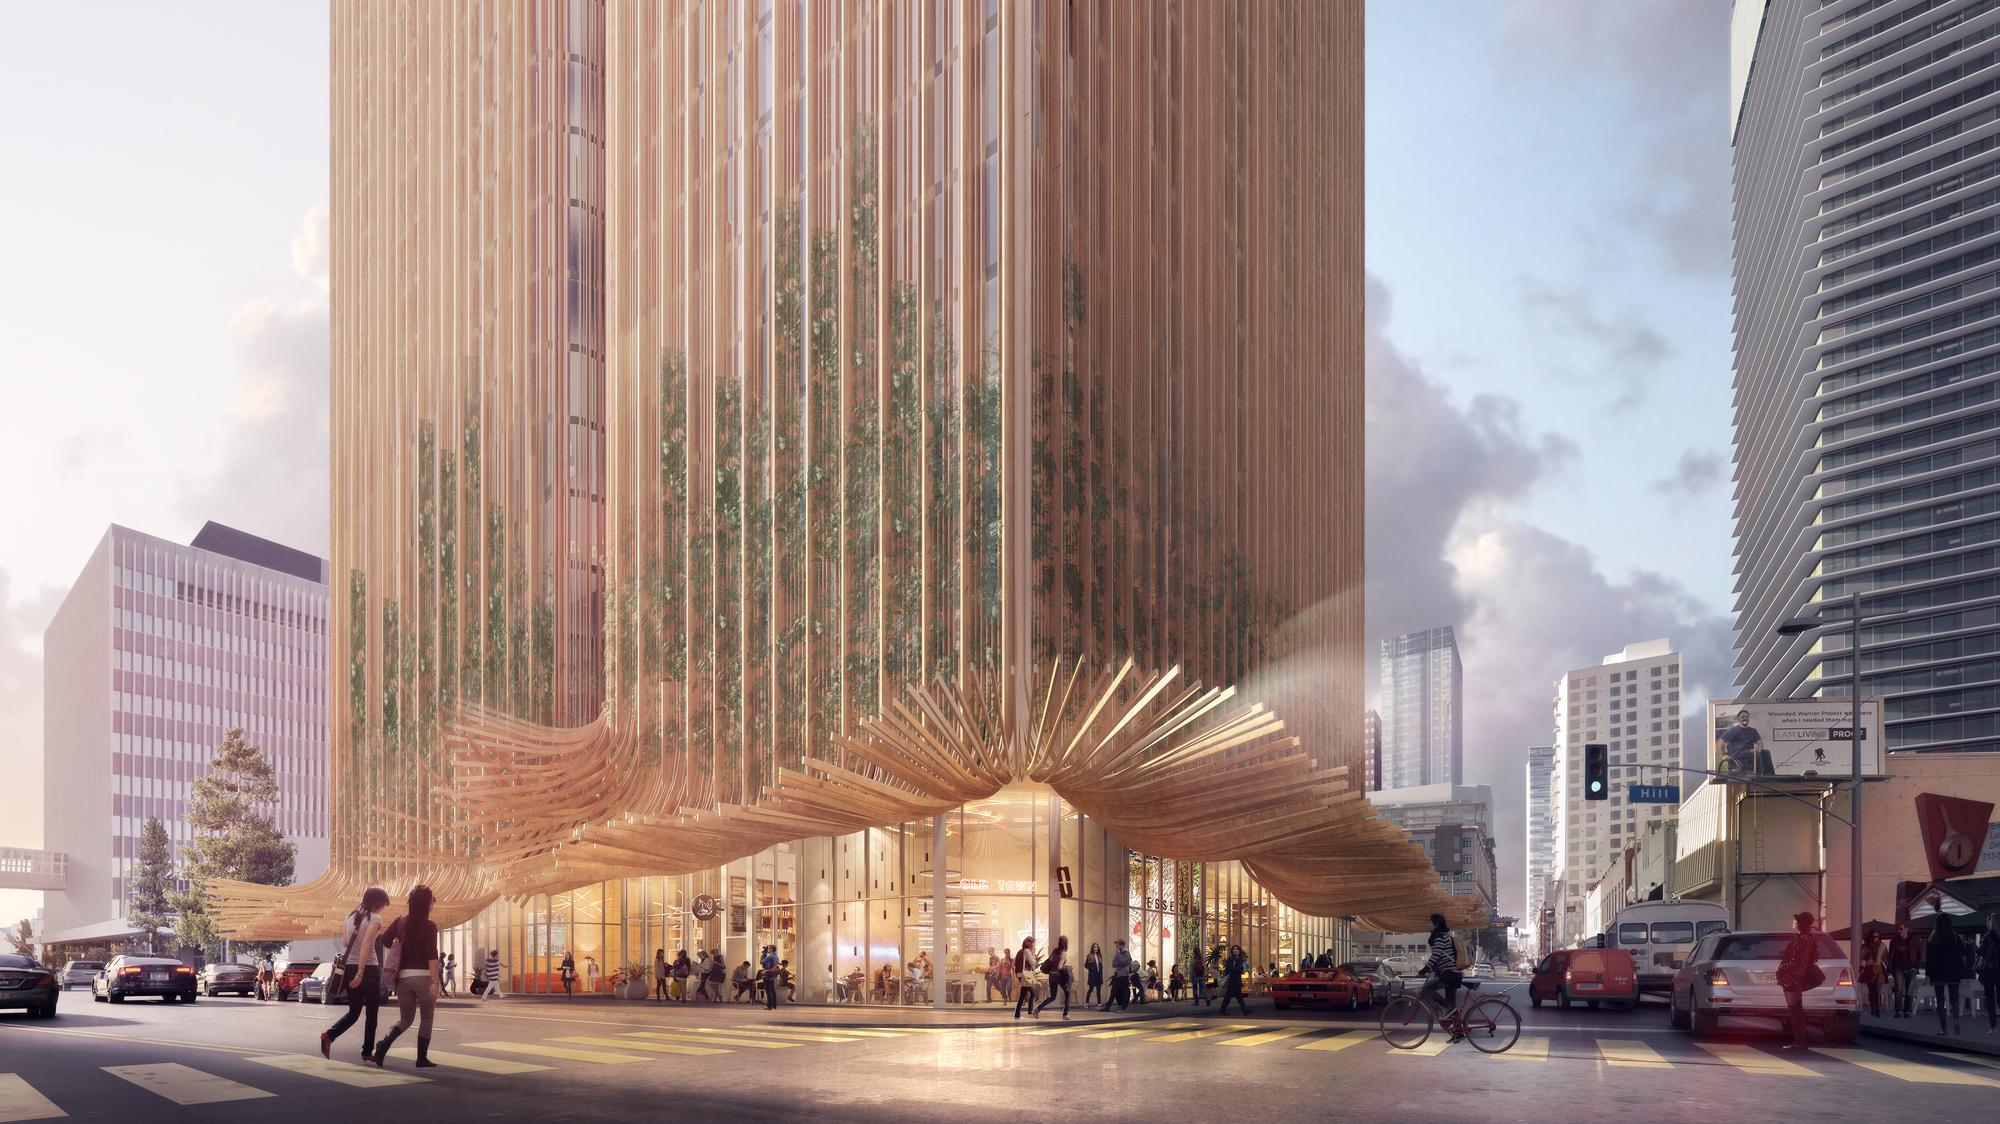 https://images.adsttc.com/media/images/5ef0/6183/b357/658c/7f00/0250/large_jpg/03_Koichi_Takada_Architects_Sky_Trees_LA_Doug___Wolf.jpg?1592811885